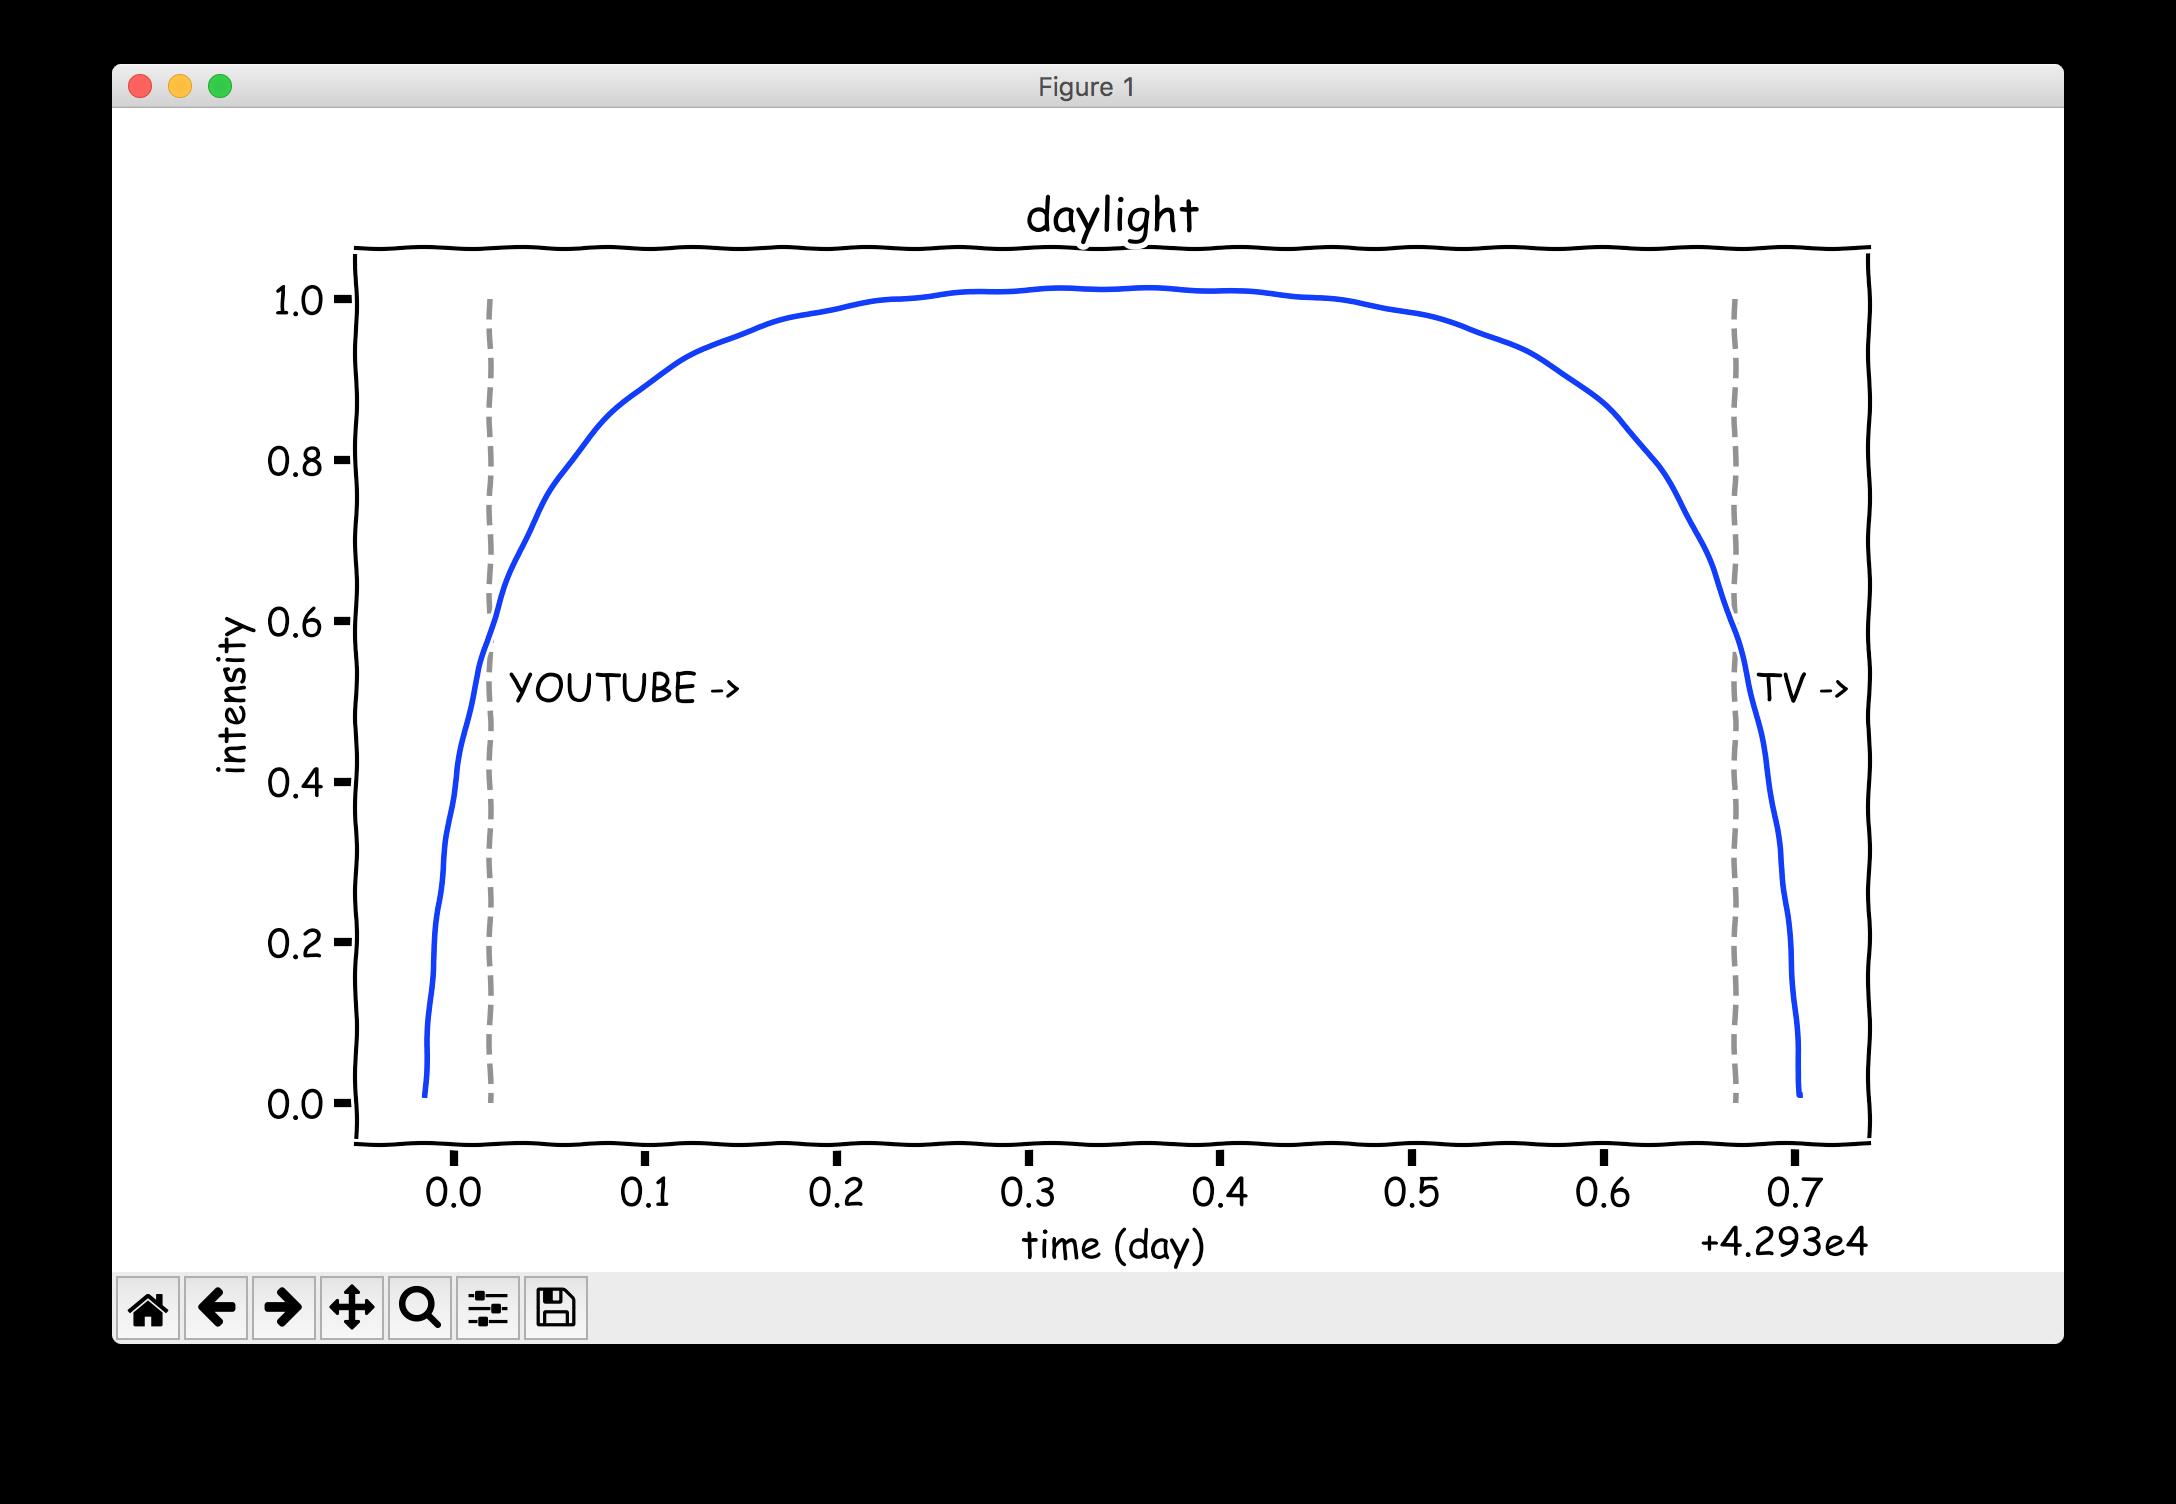 Figure 1: Programmable Bézier curve describing daylight light intensity ( XKCD  styling courtesy of  Matplotlib )